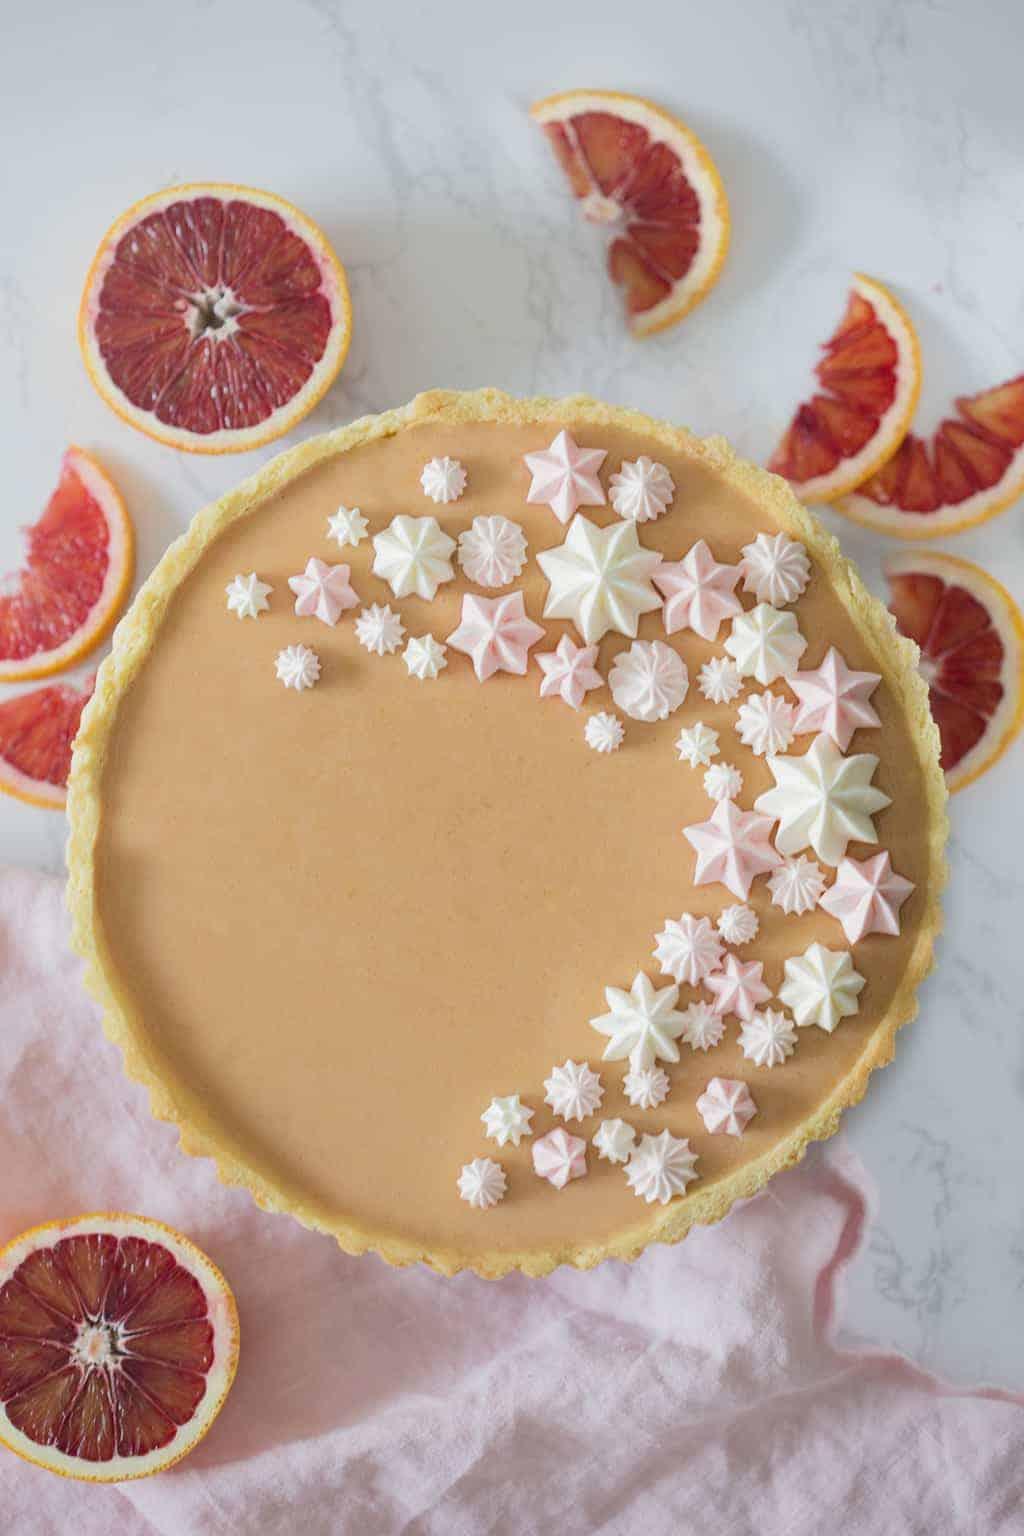 A blood orange curd tart with Swiss buttercream dollops on top.